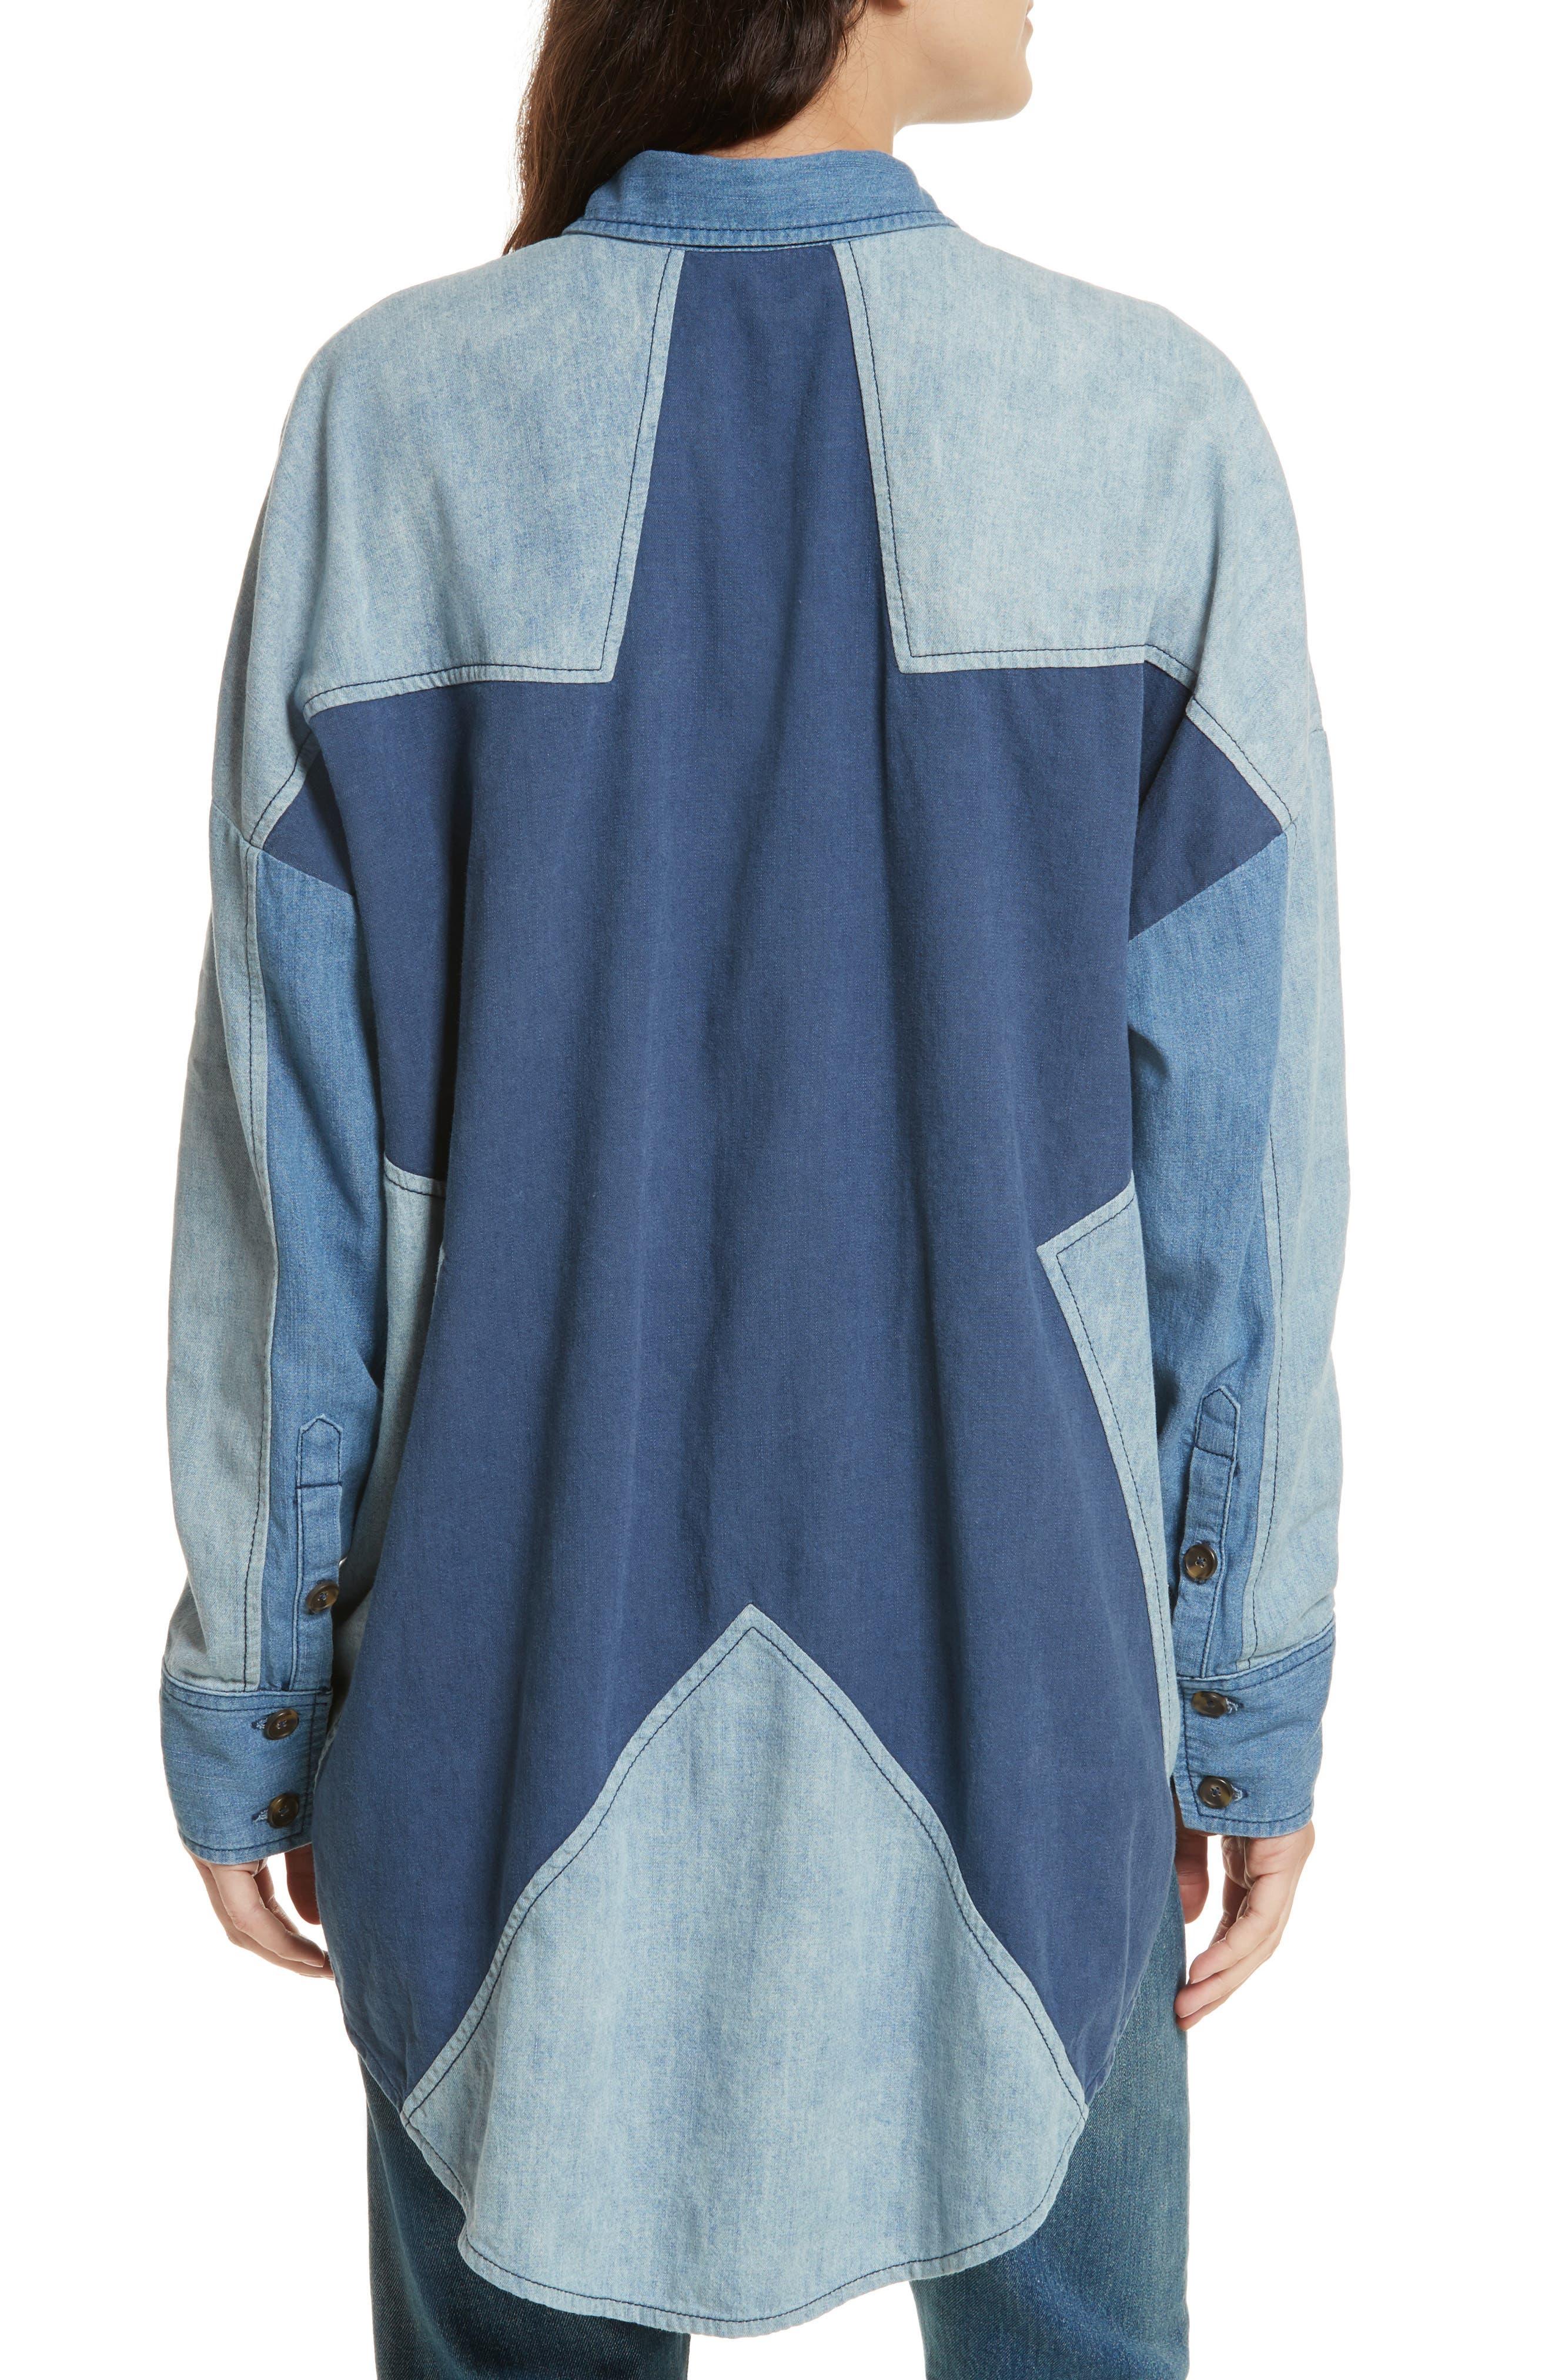 Superstar Chambray Shirt,                             Alternate thumbnail 2, color,                             400